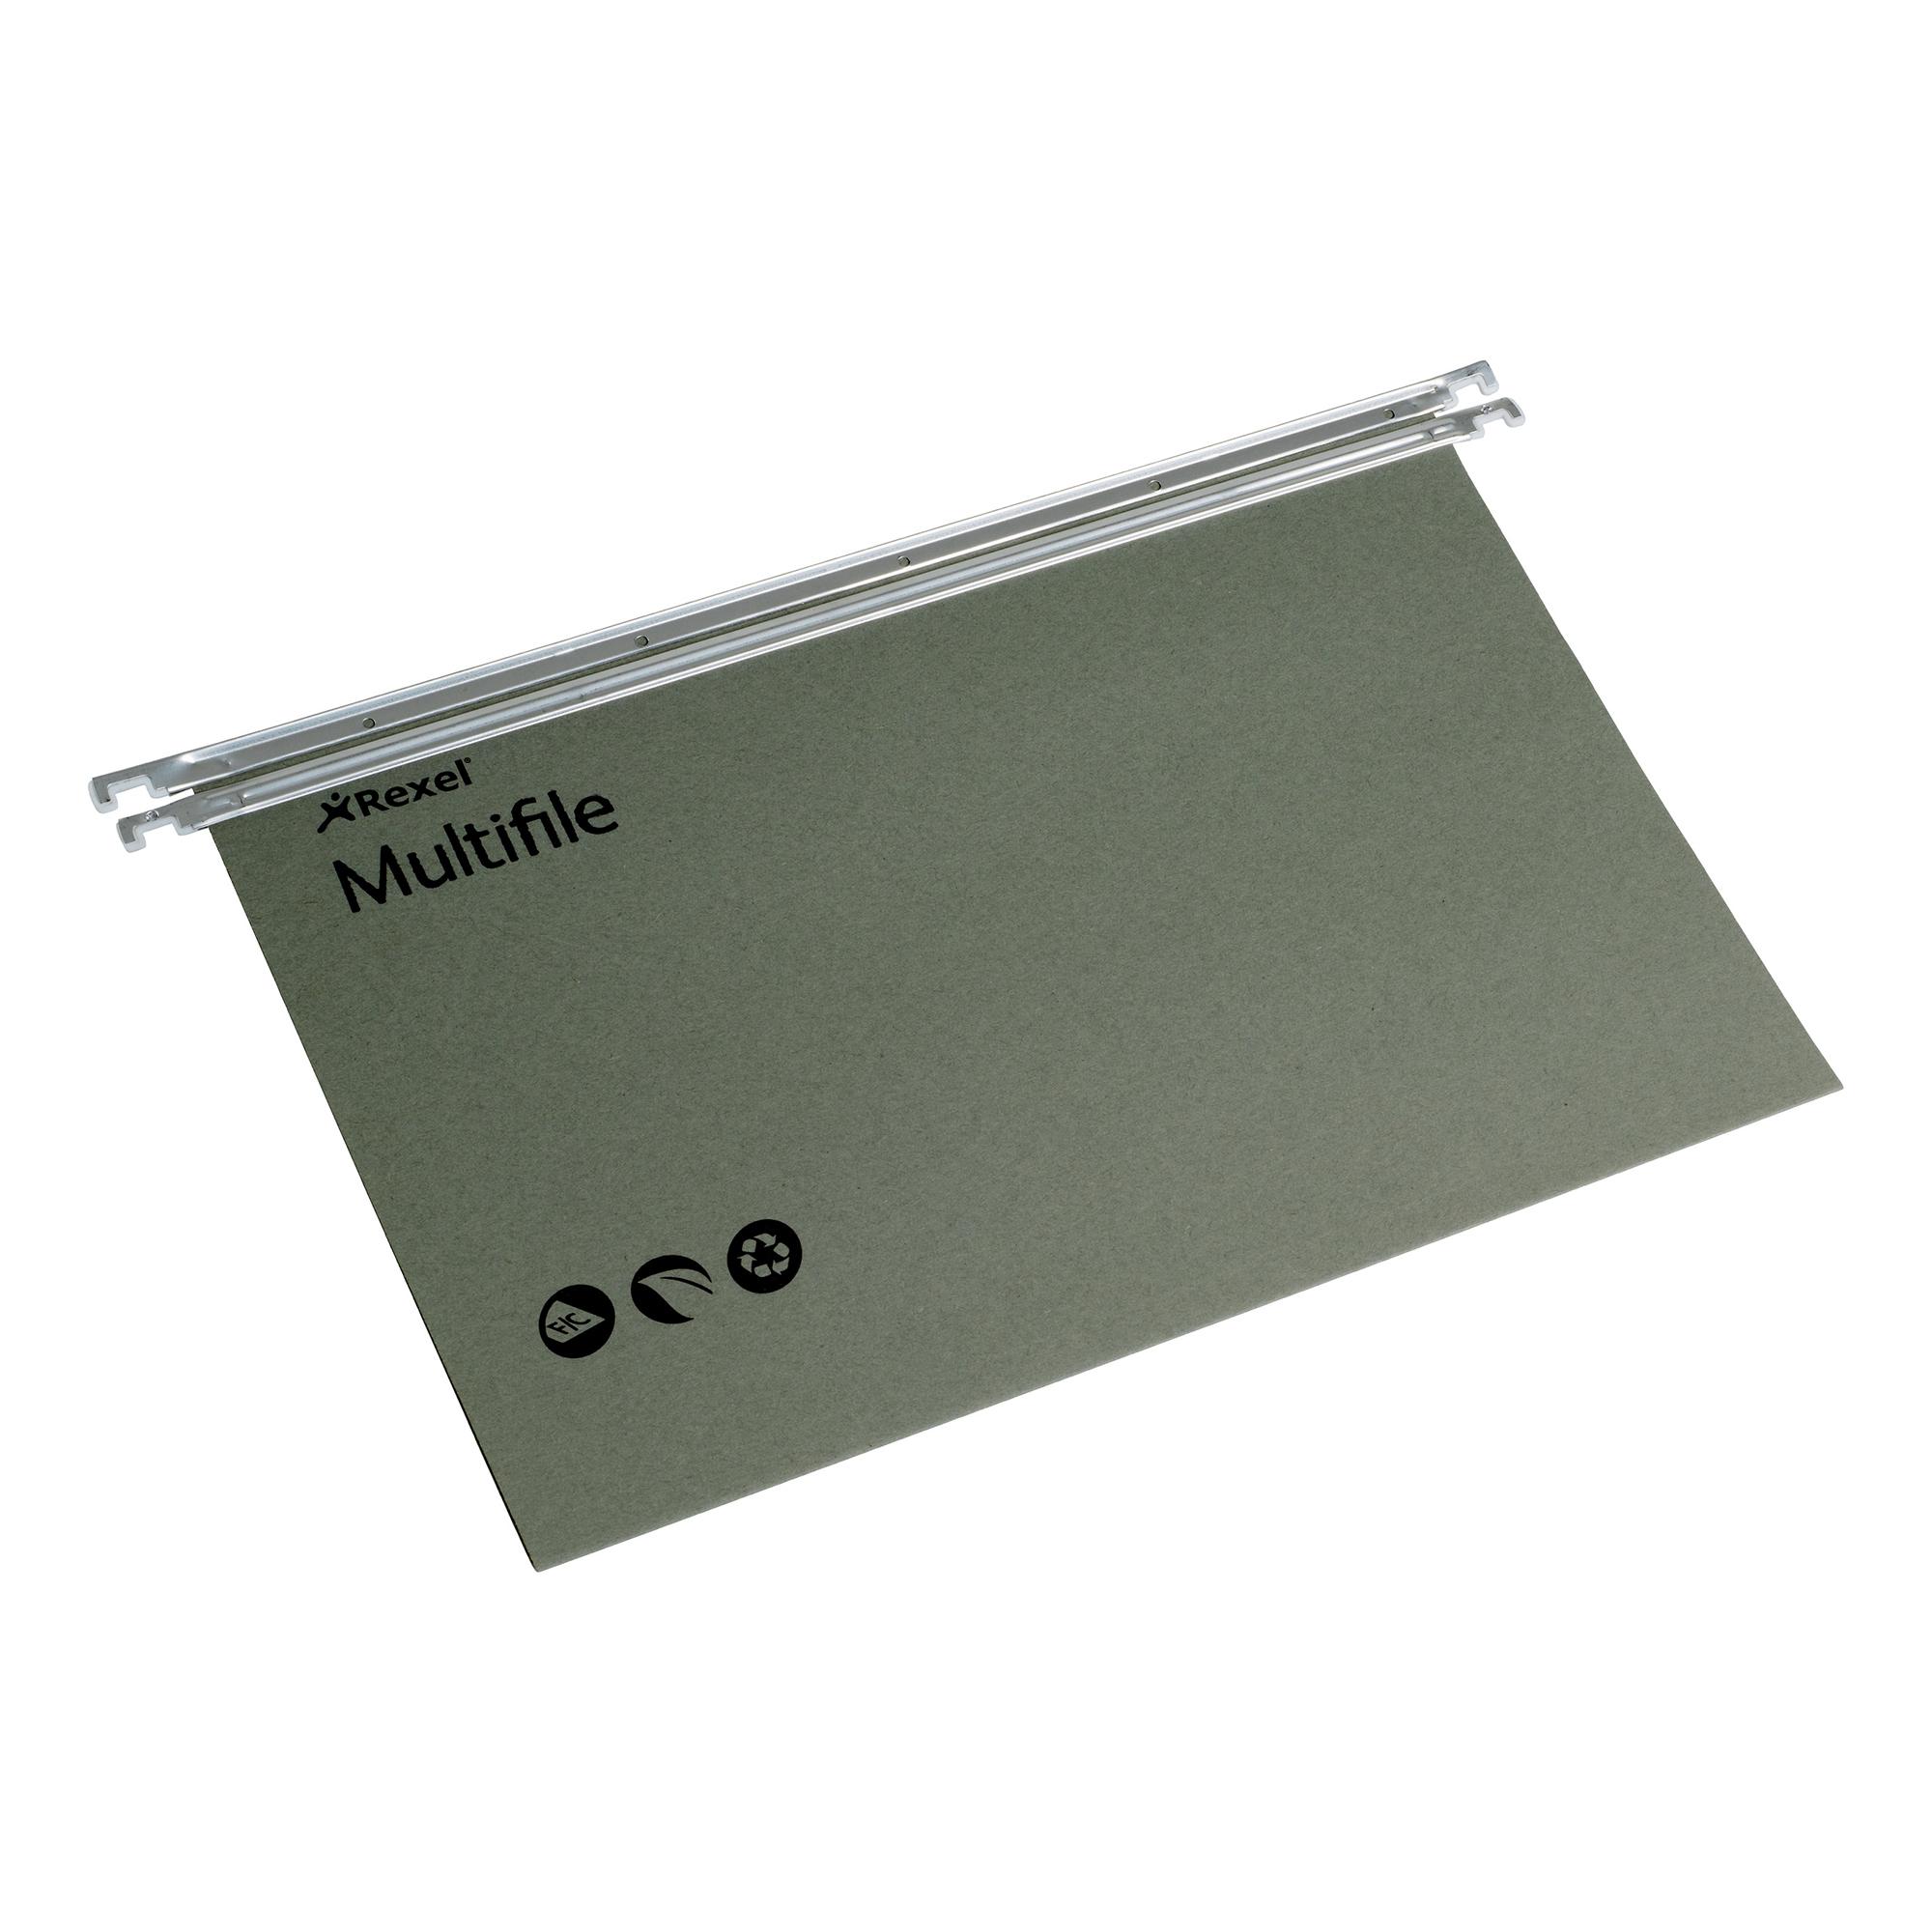 Rexel Multifile Suspension File Manilla 15mm V-base 180gsm Foolscap Green Ref 78008 [Pack 50]